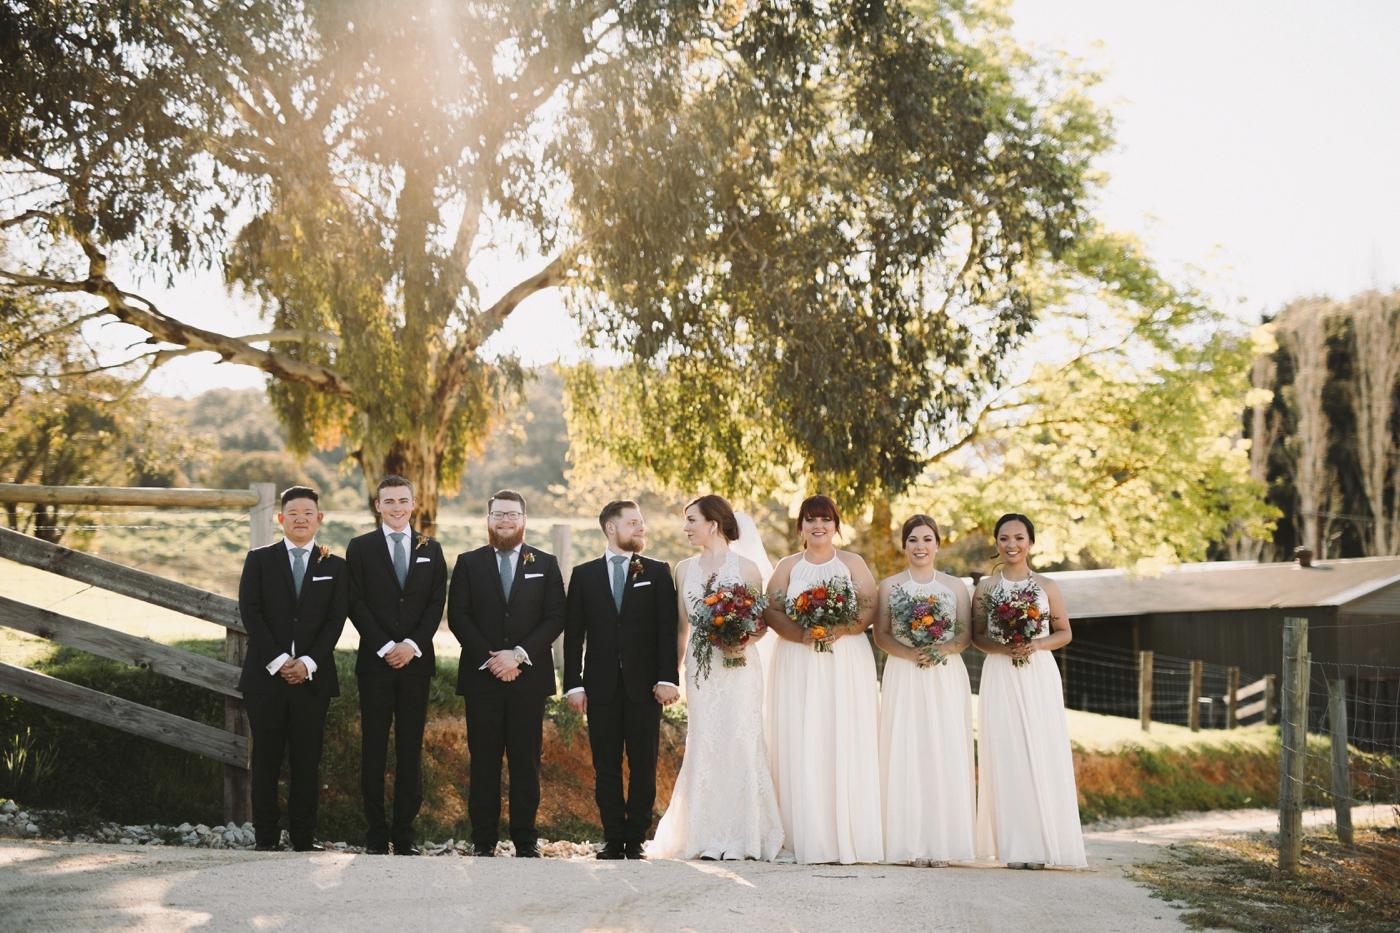 Erin & Ryan - Natural Wedding Photographer in Adelaide - Maximillians Wedding - Simple and Modern Wedding Photographer - Katherine Schultz - www.katherineschultzphotography.com_0038.jpg